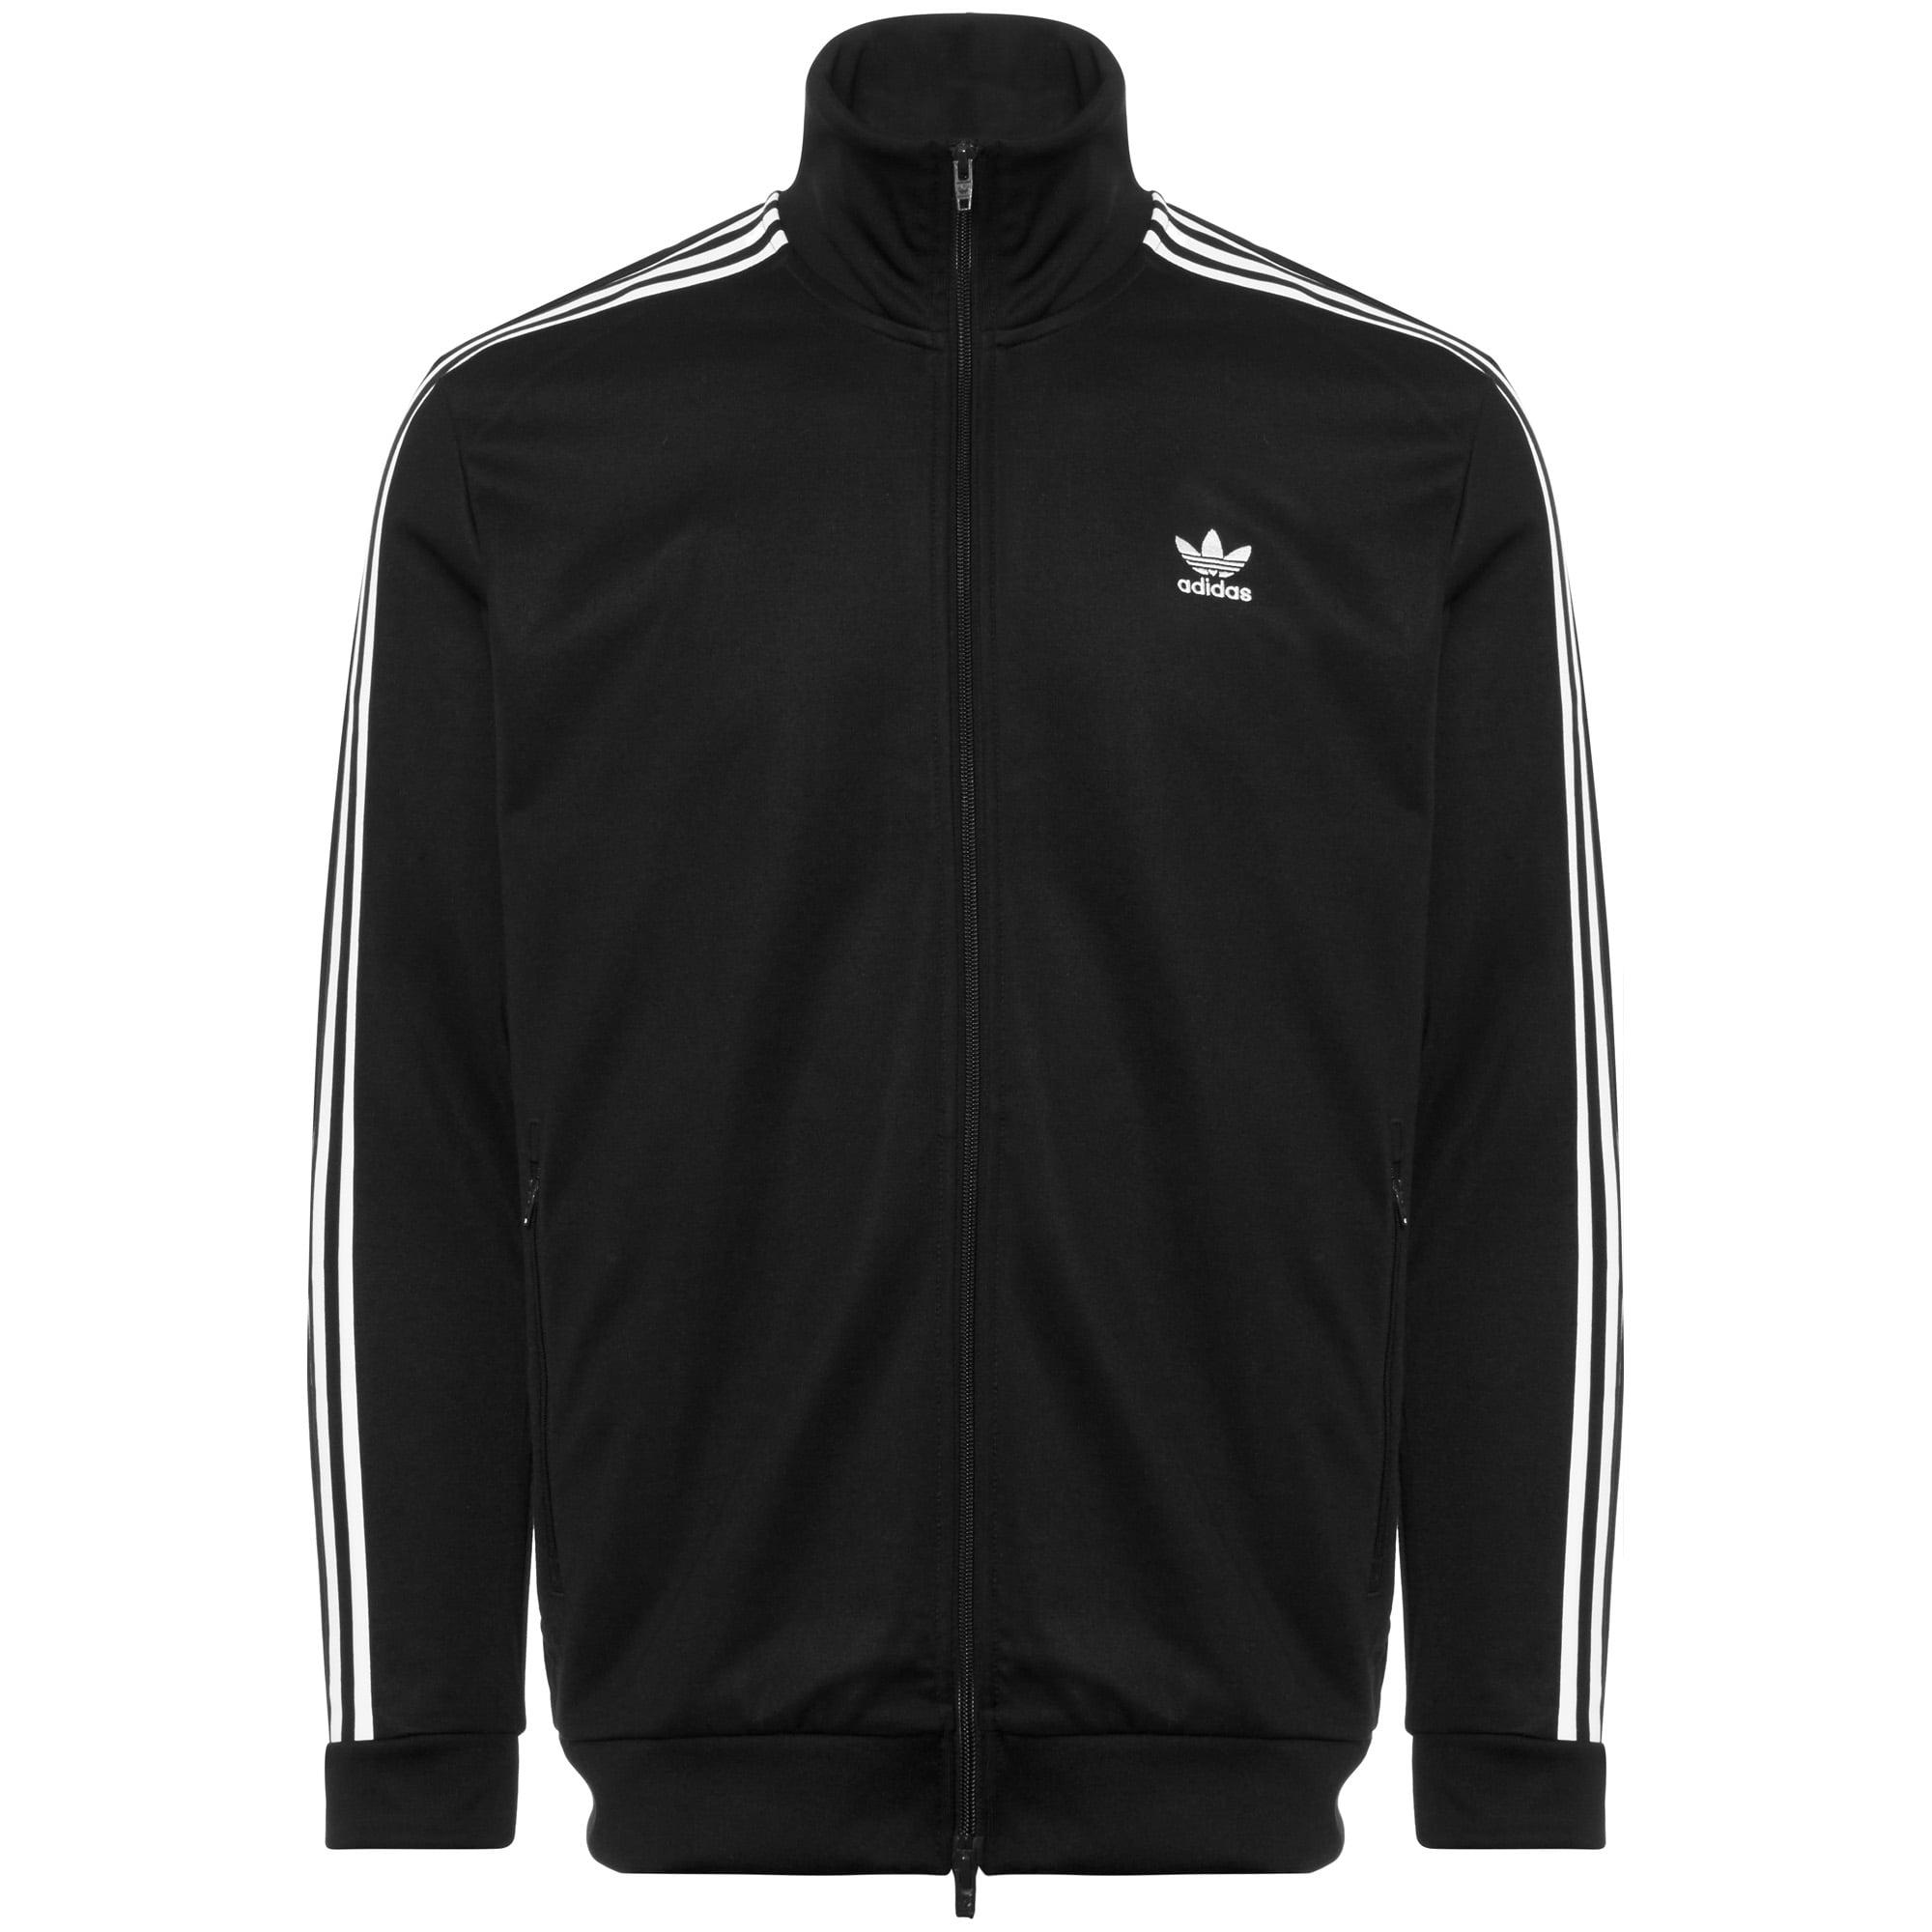 best service ab818 19756 Adidas (Black) Beckenbauer Jacket CW1250  Dandy Fellow